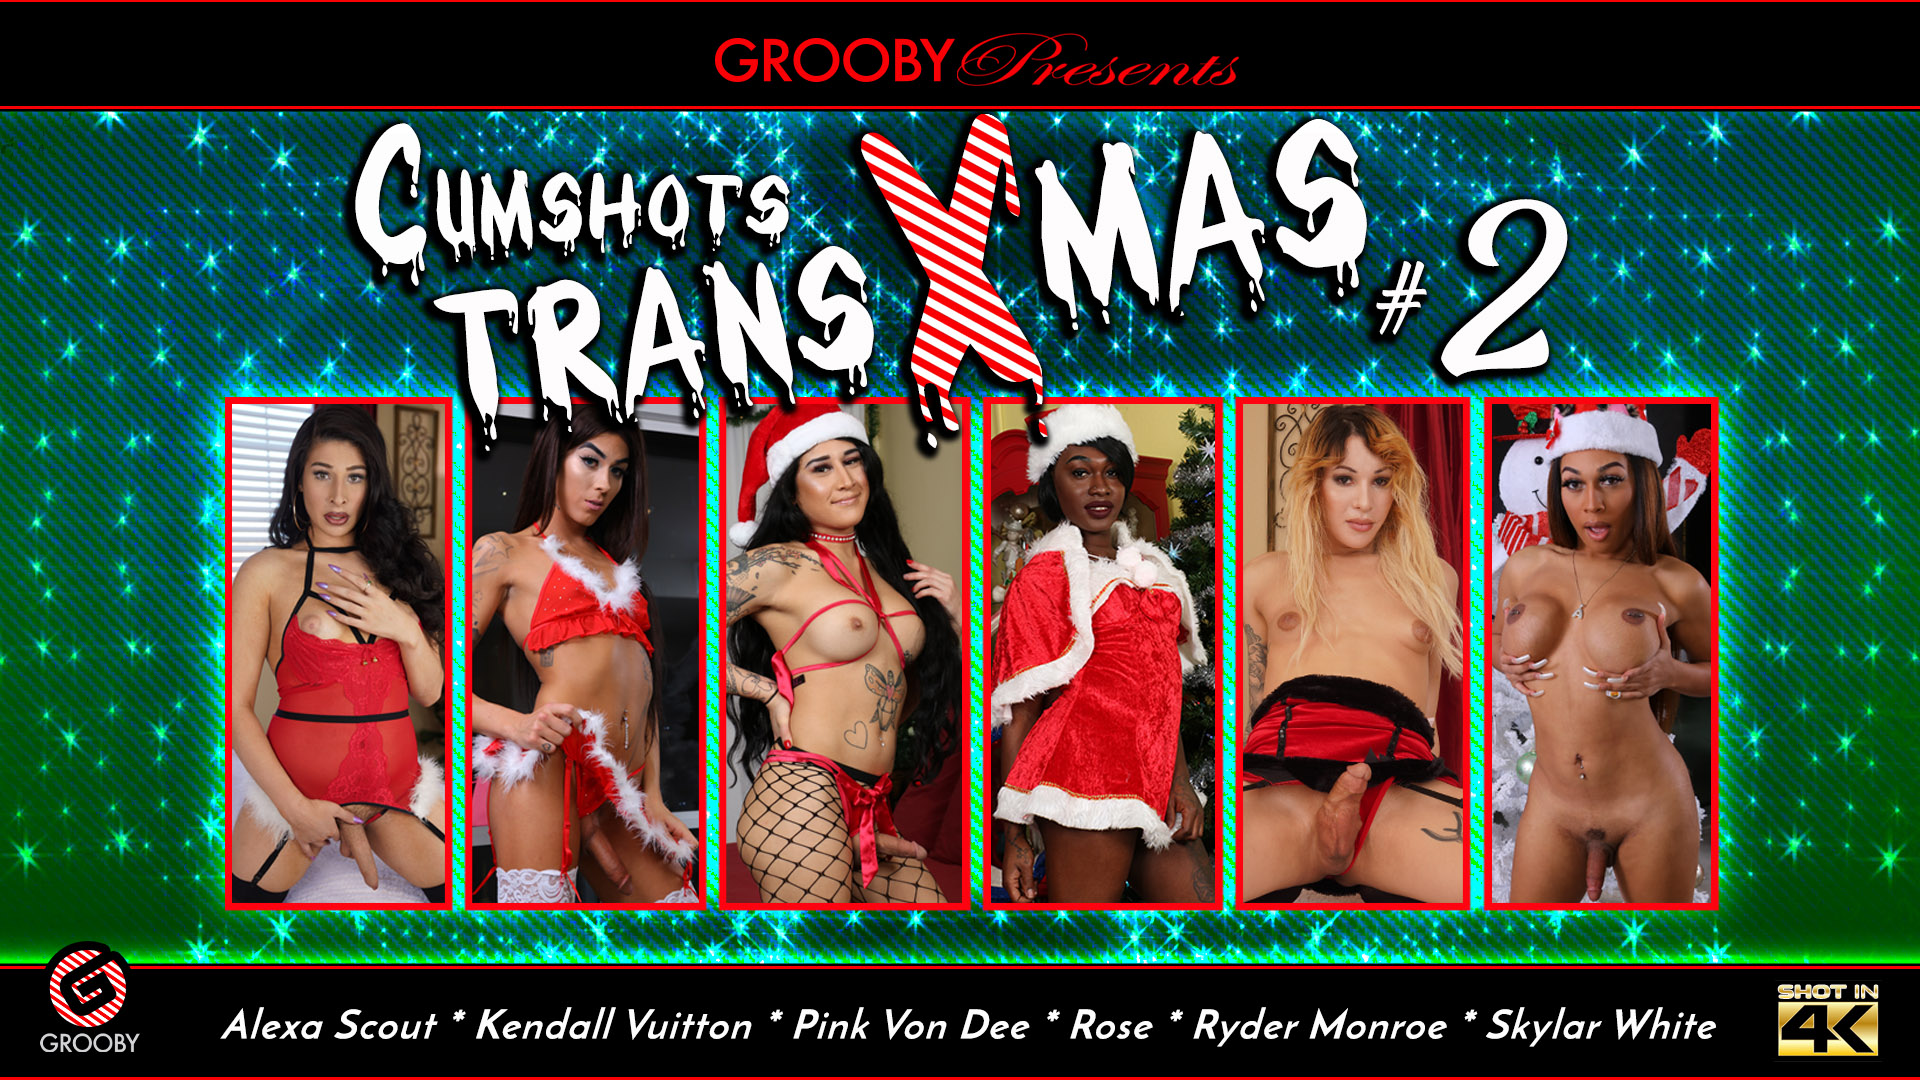 Cumshots Trans Xmas #2 DVD Trailer